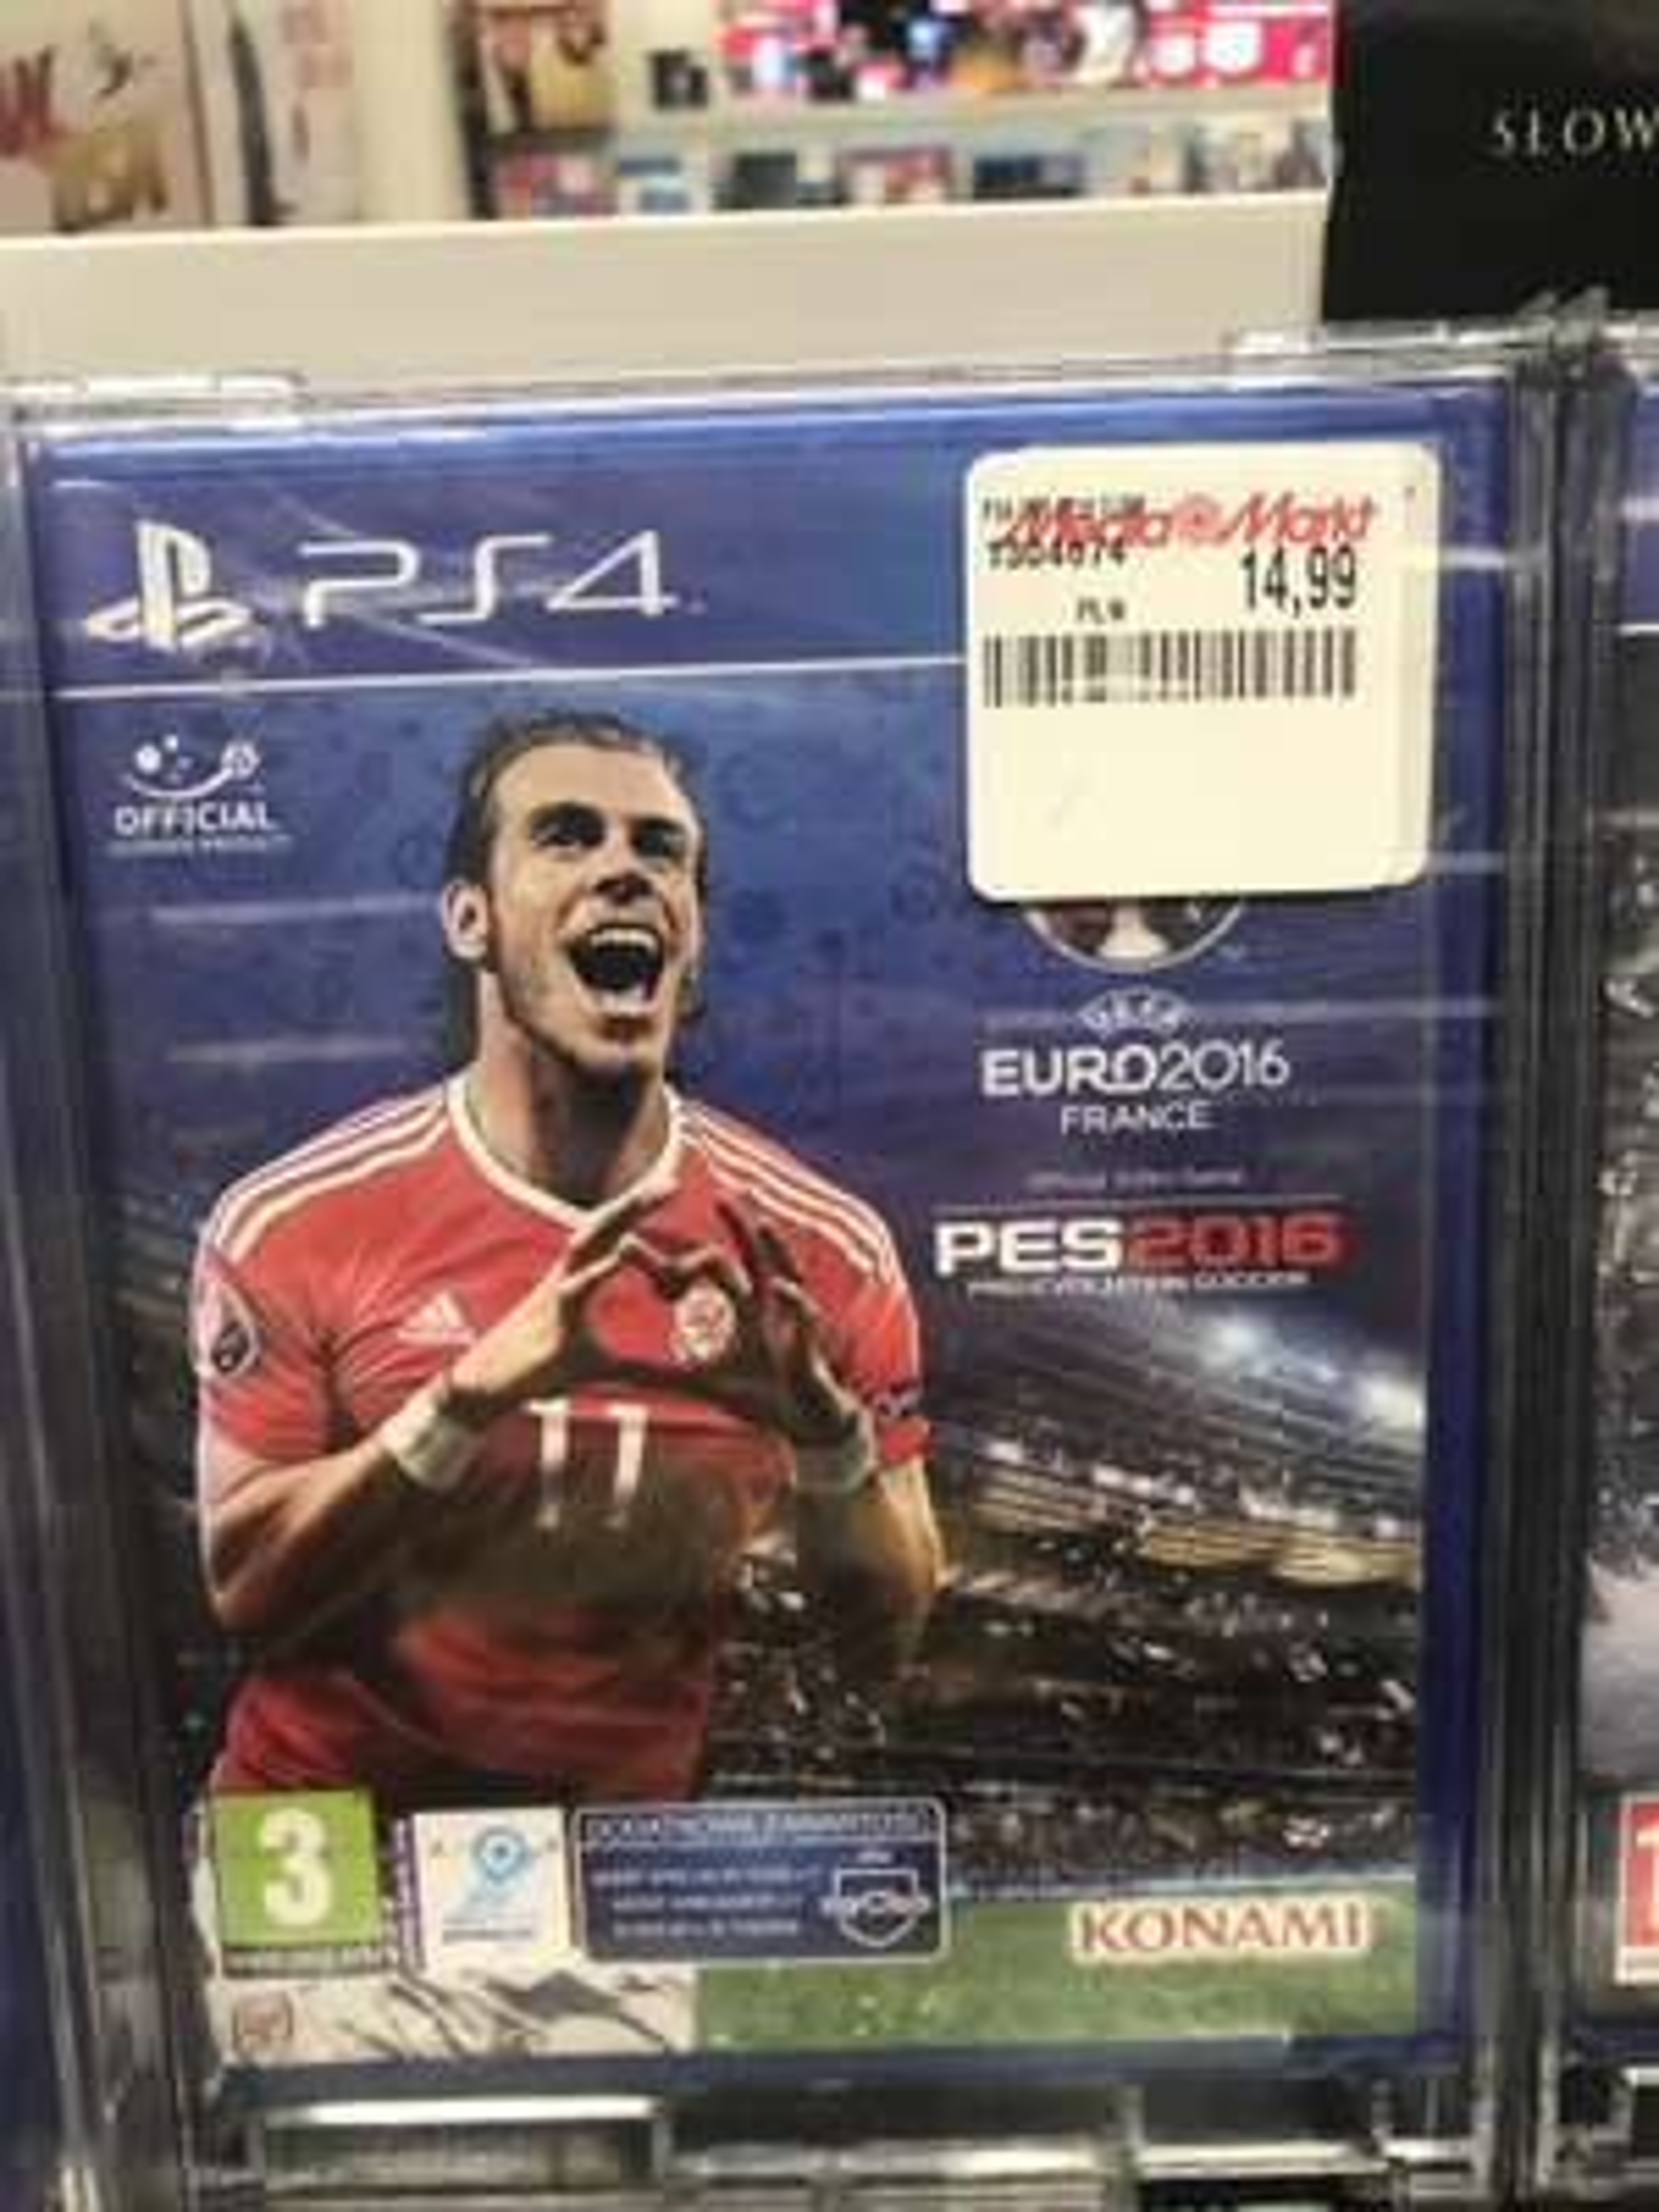 Pro evolution soccer 2016 wersja euro 2016 ps4